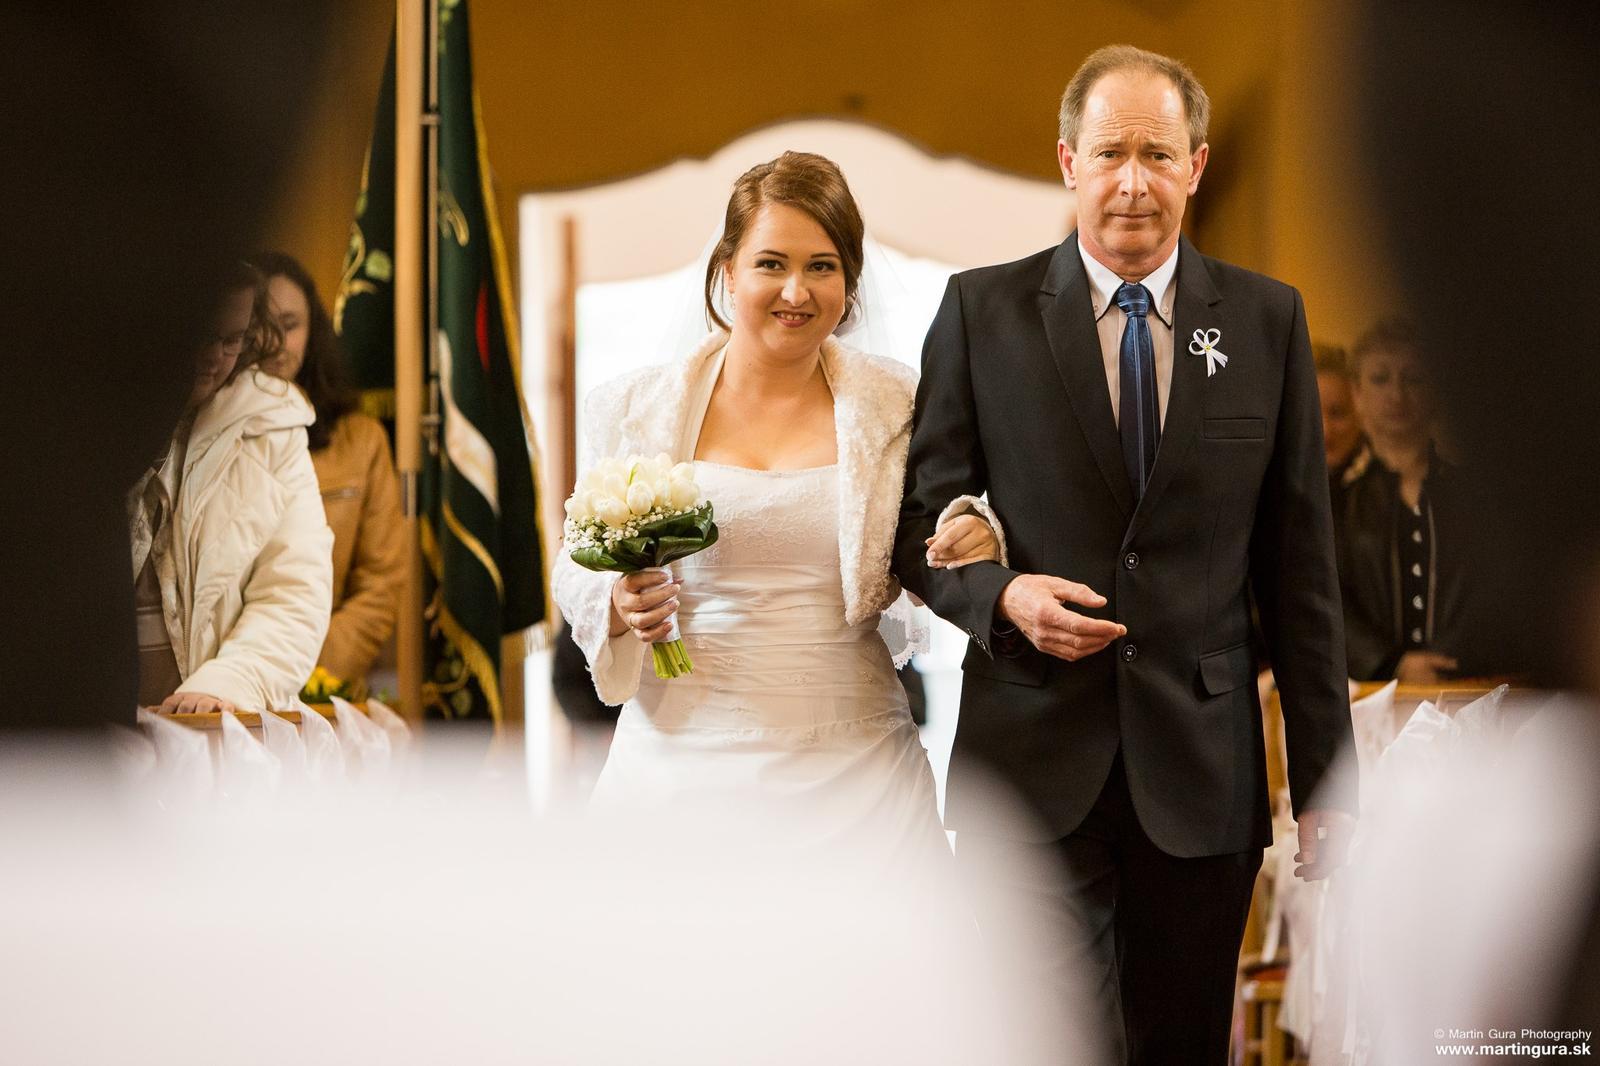 Svadba Juraj s Andrea - Obrázok č. 5